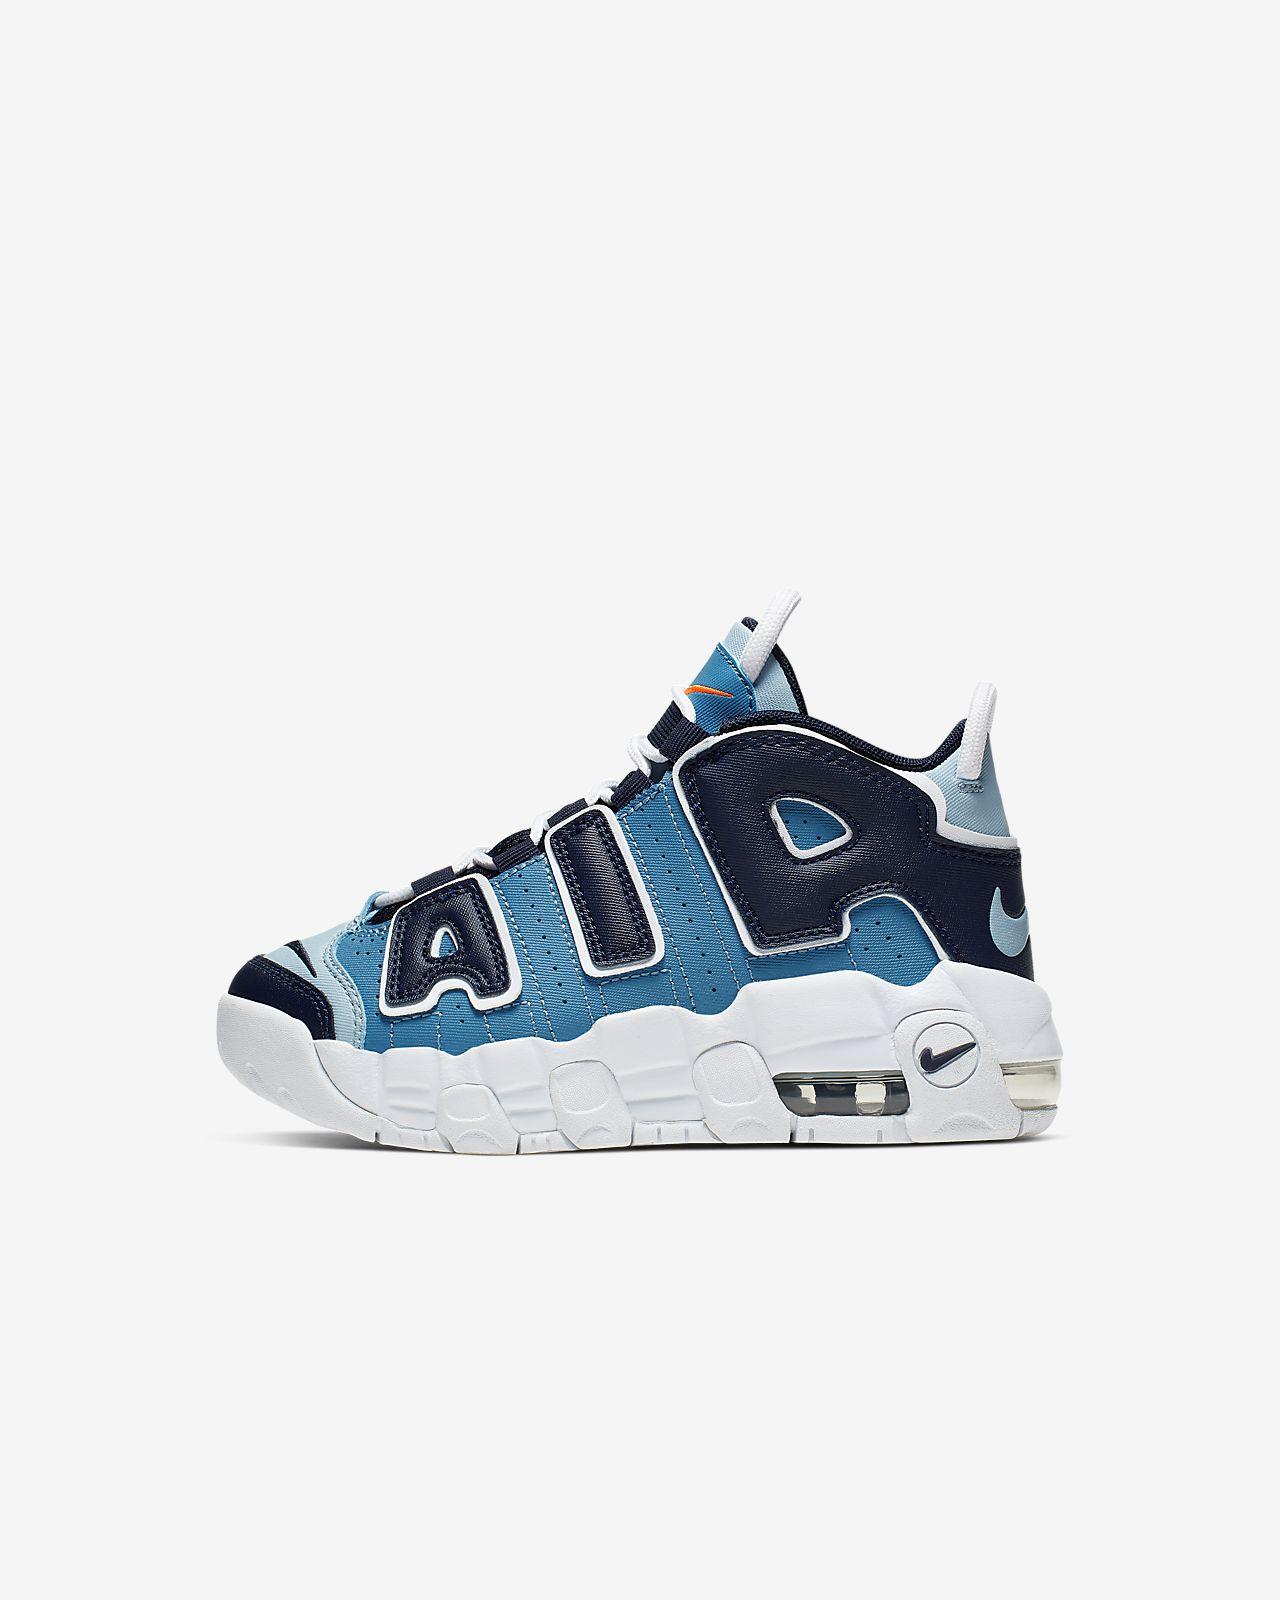 Nike Air More Uptempo Schuh für jüngere Kinder